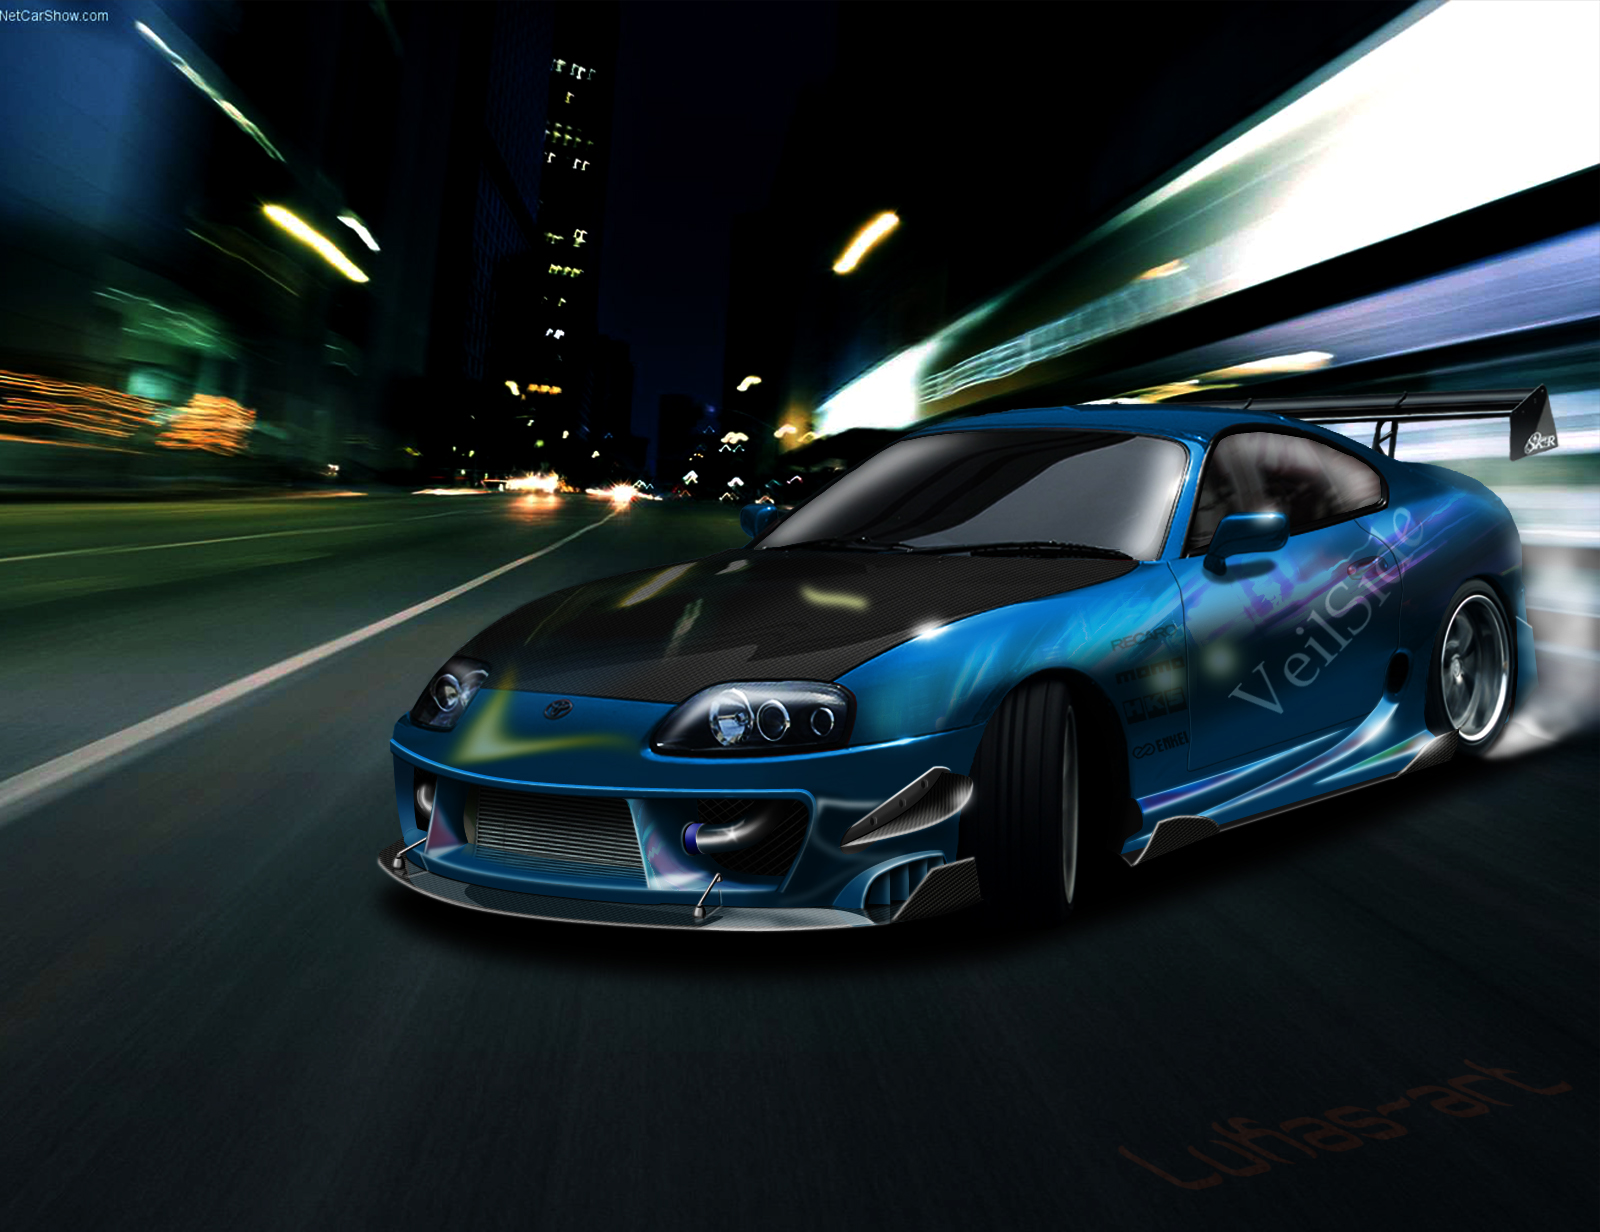 2016 Tundra Diesel >> Dashing Blue Toyota Supra HD Wallpaper - My Site